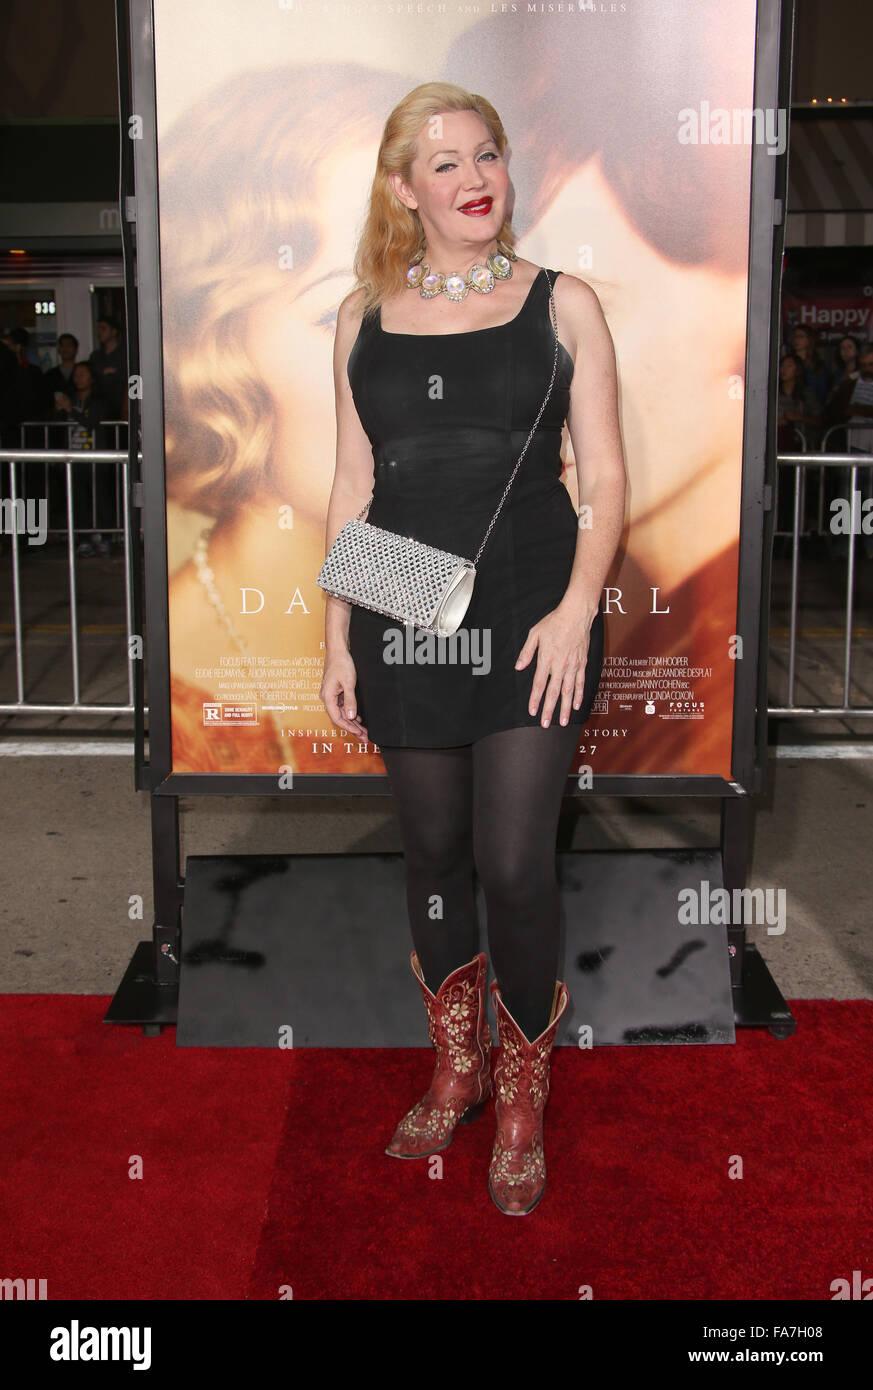 Happy Salma,Sonal Chauhan Adult clips Joanne Woodward,Velia Martinez